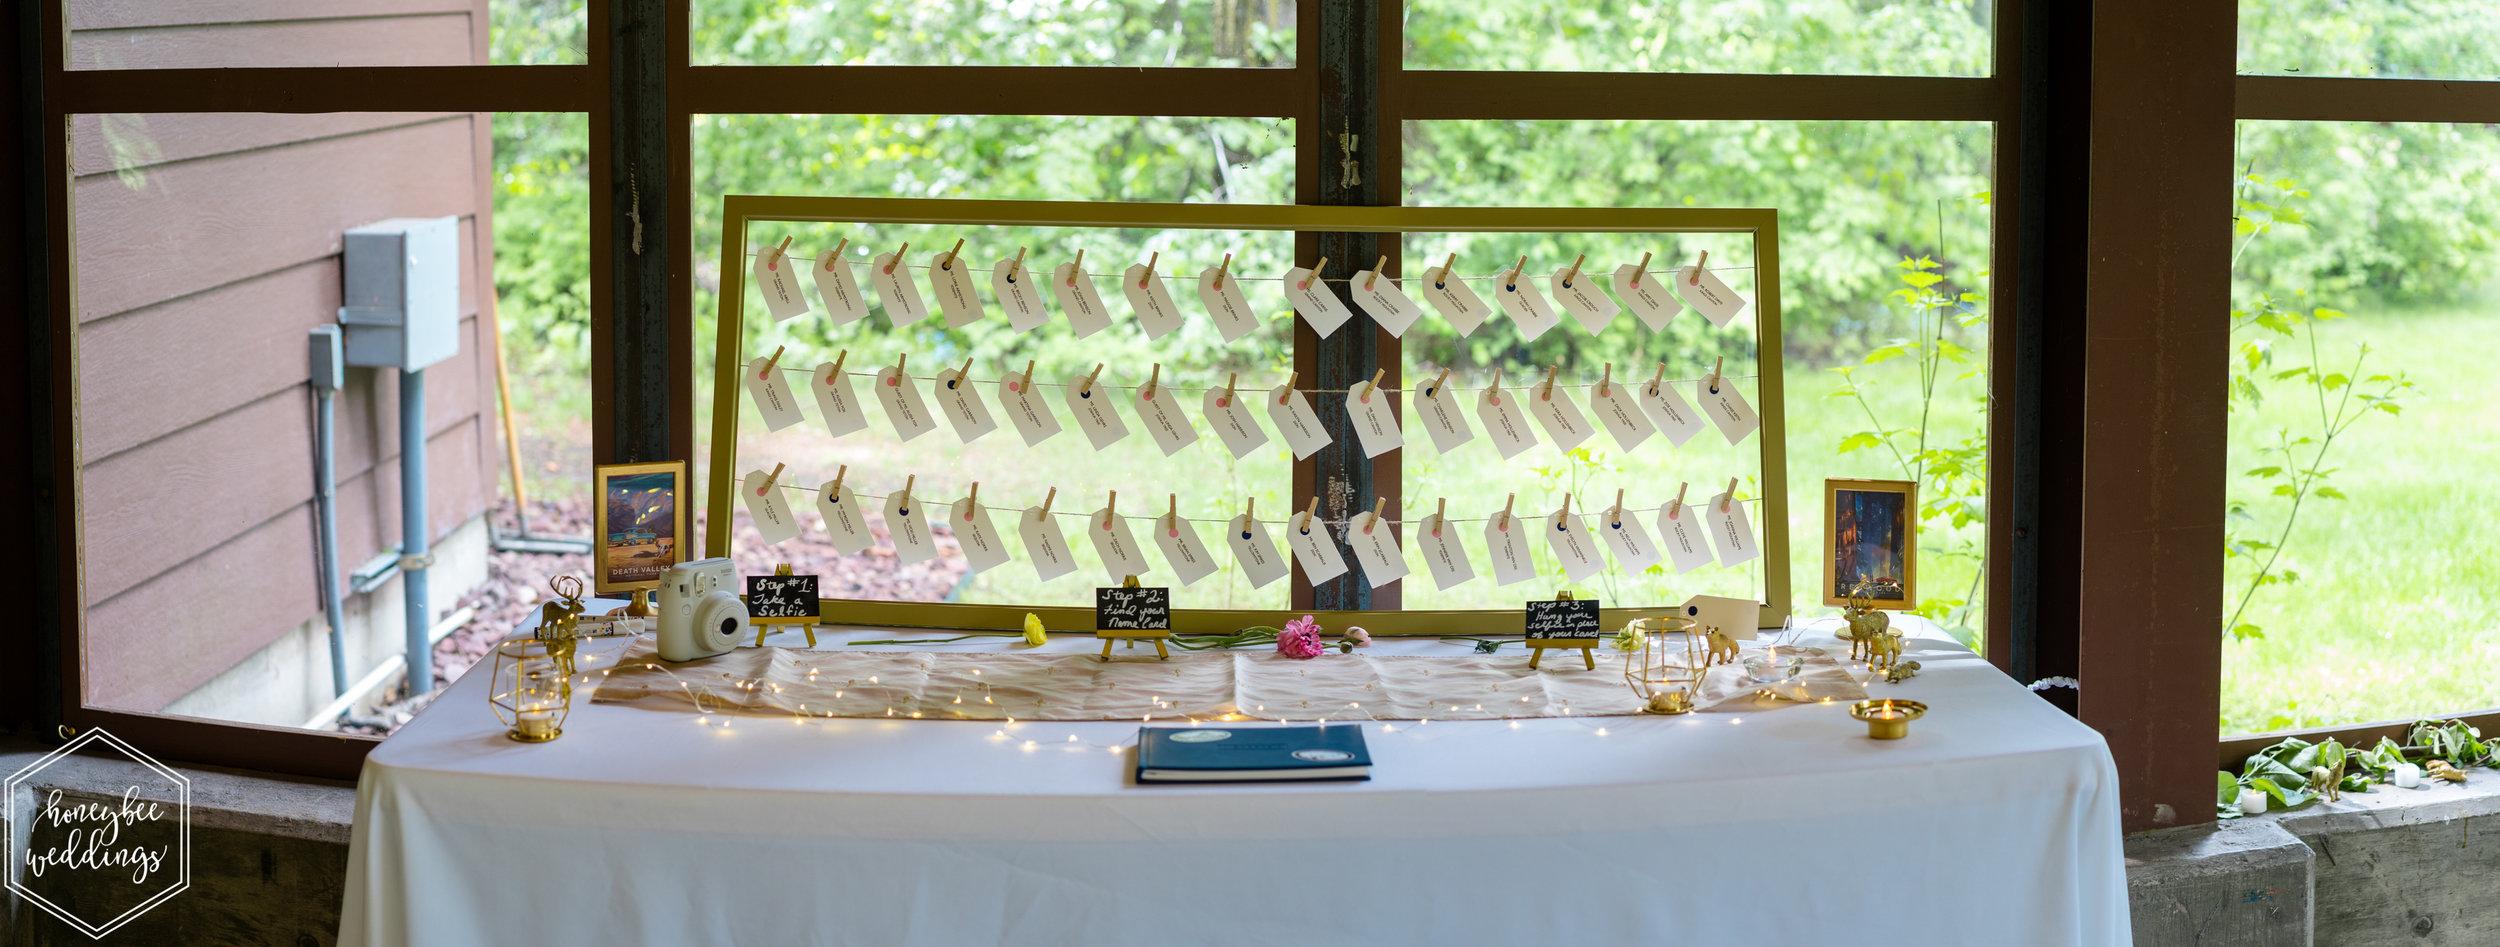 012Glacier National Park Wedding_Izaak Walton Inn Wedding_Honeybee Weddings_Norah & Kyle_June 08, 2019-71-Pano.jpg